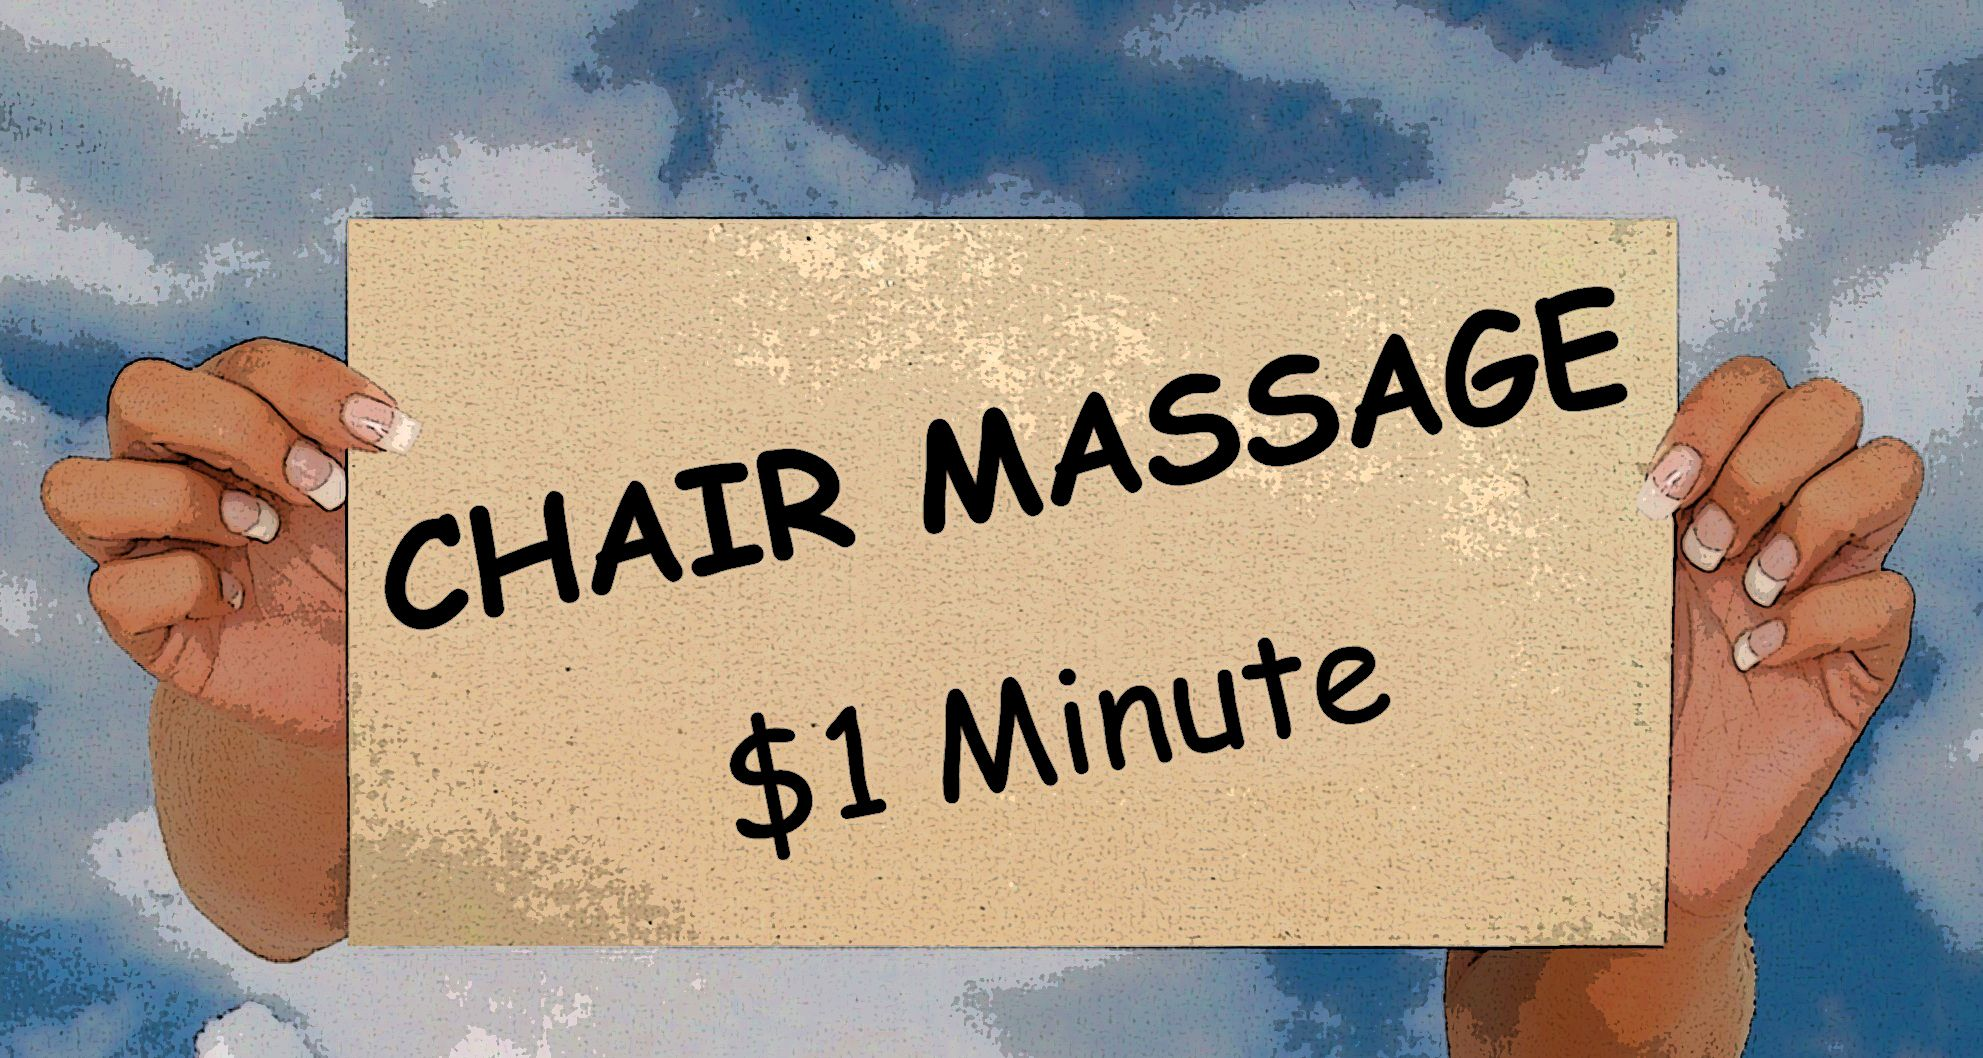 Chair Massage 1 Minute Massage Business Massage Chair Massage